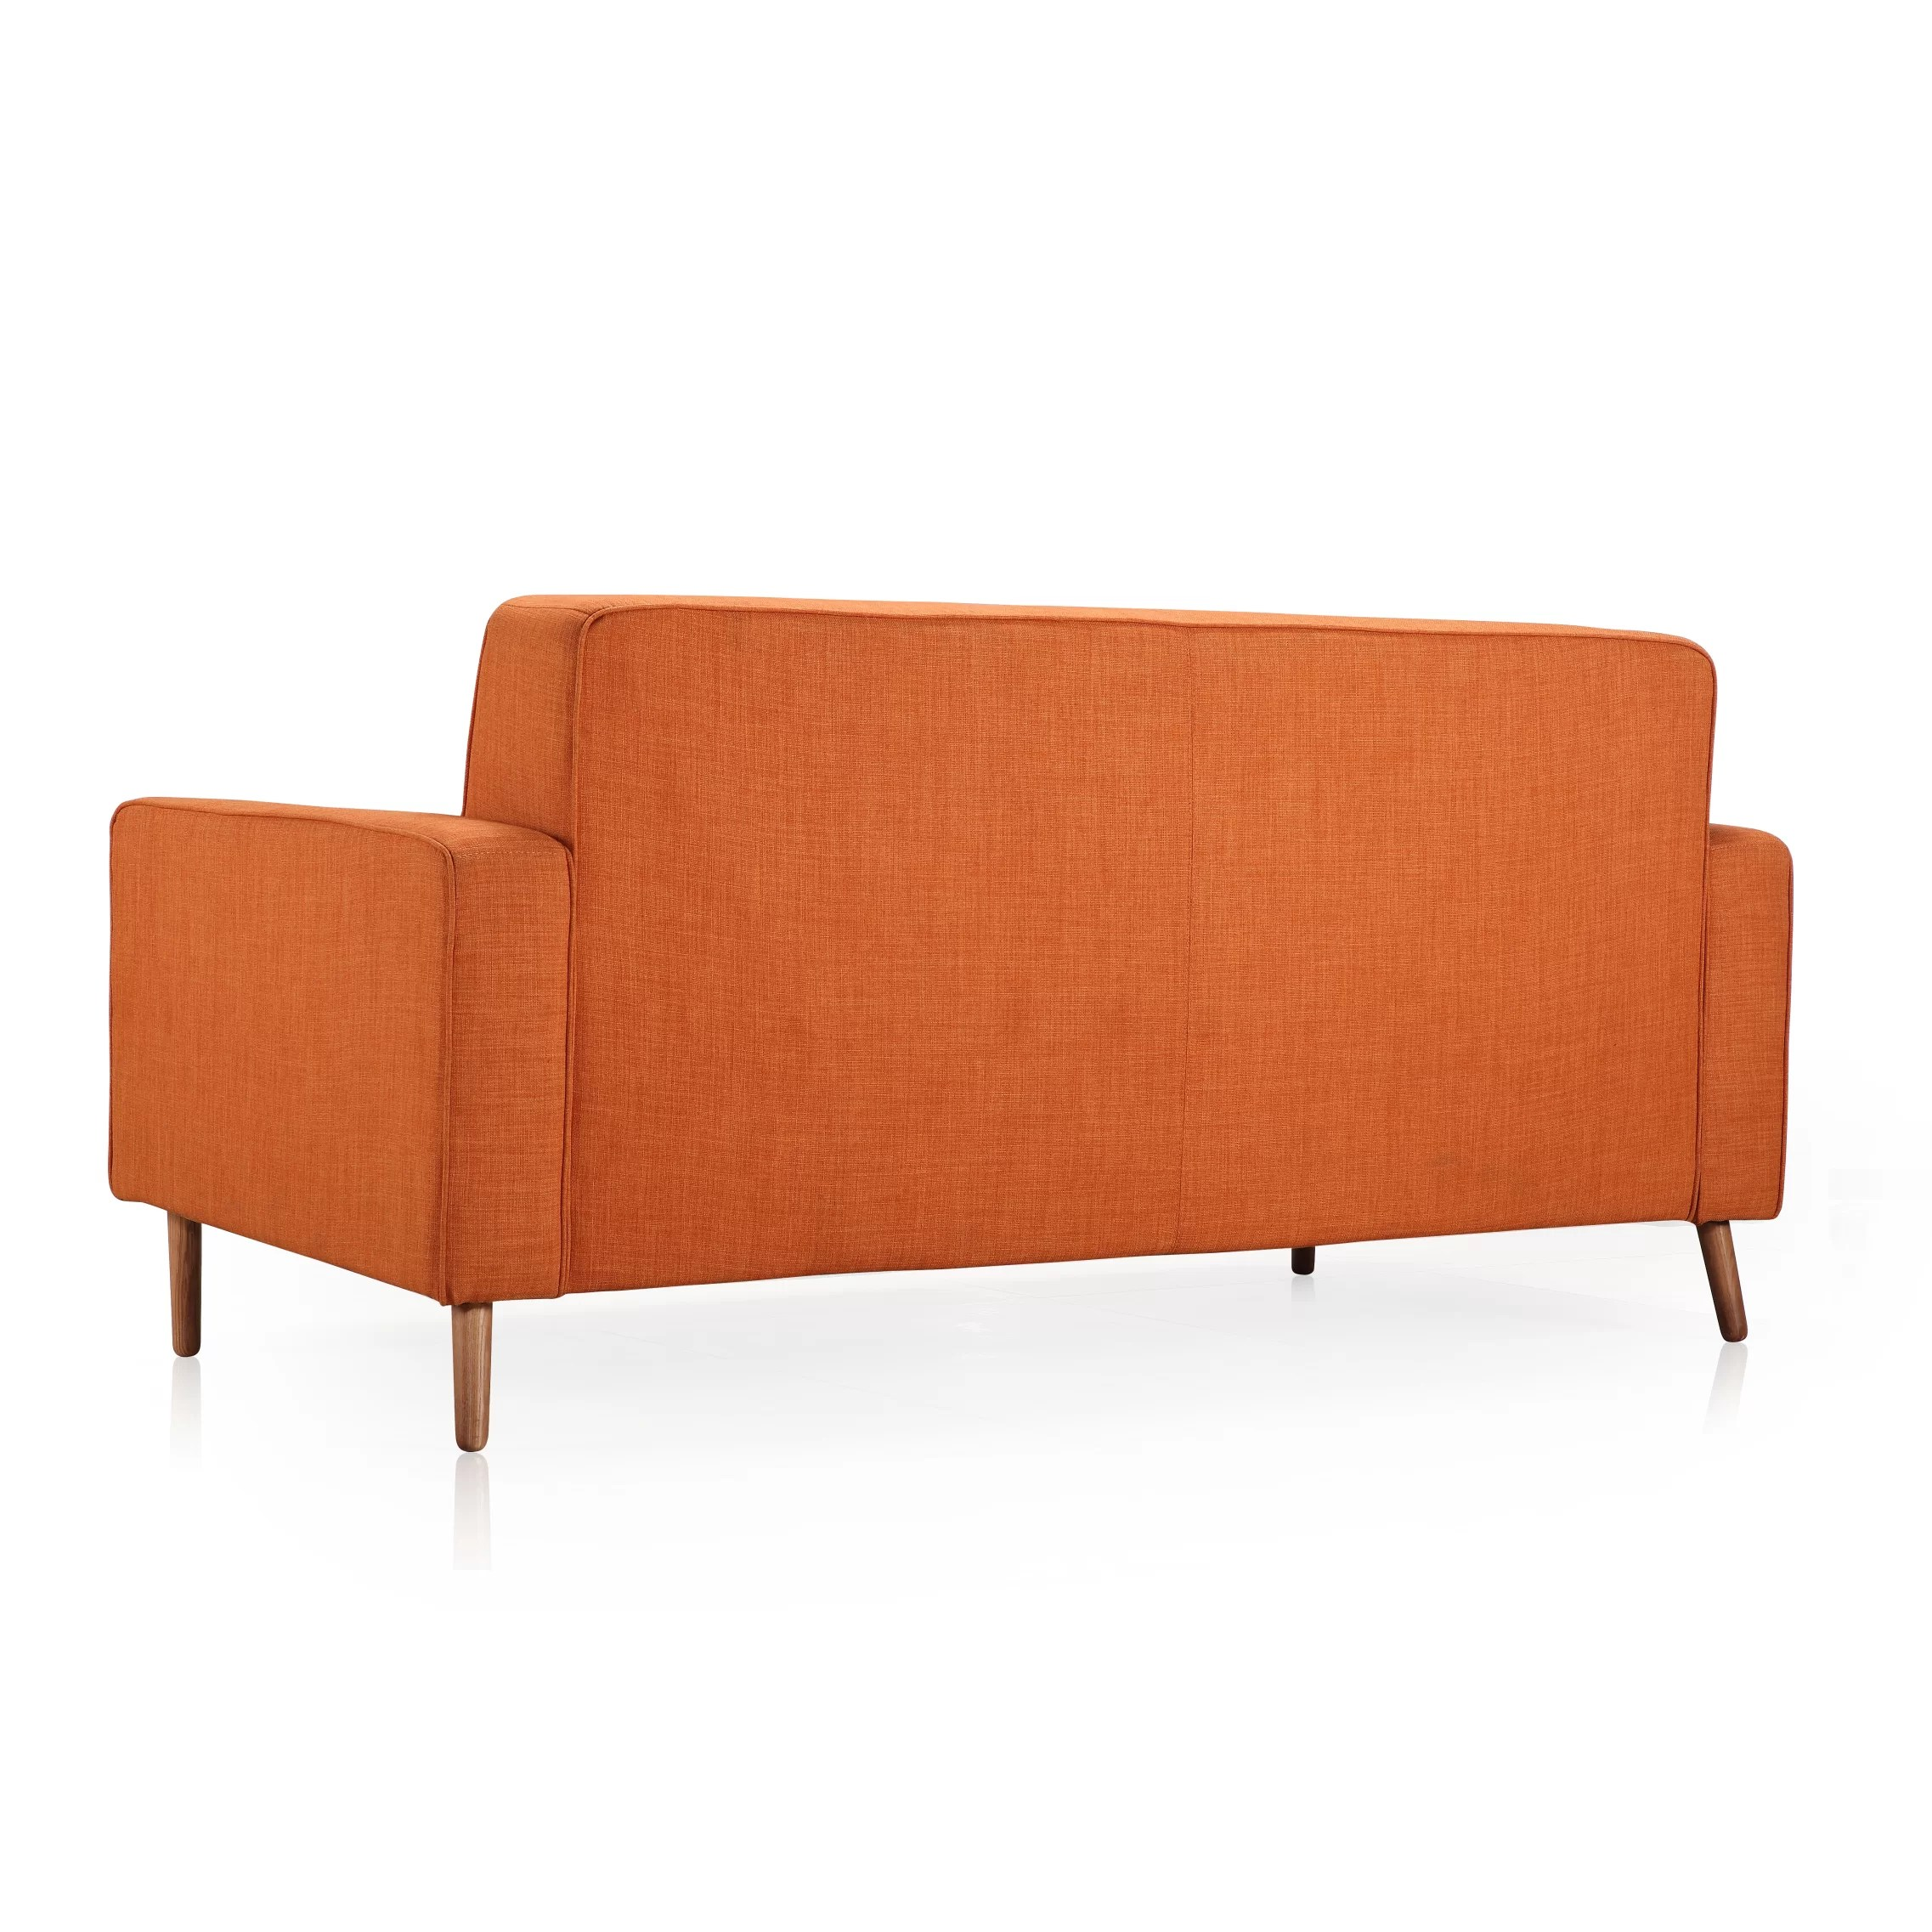 baxter sofa jual bed bekas di jakarta ceets and reviews wayfair